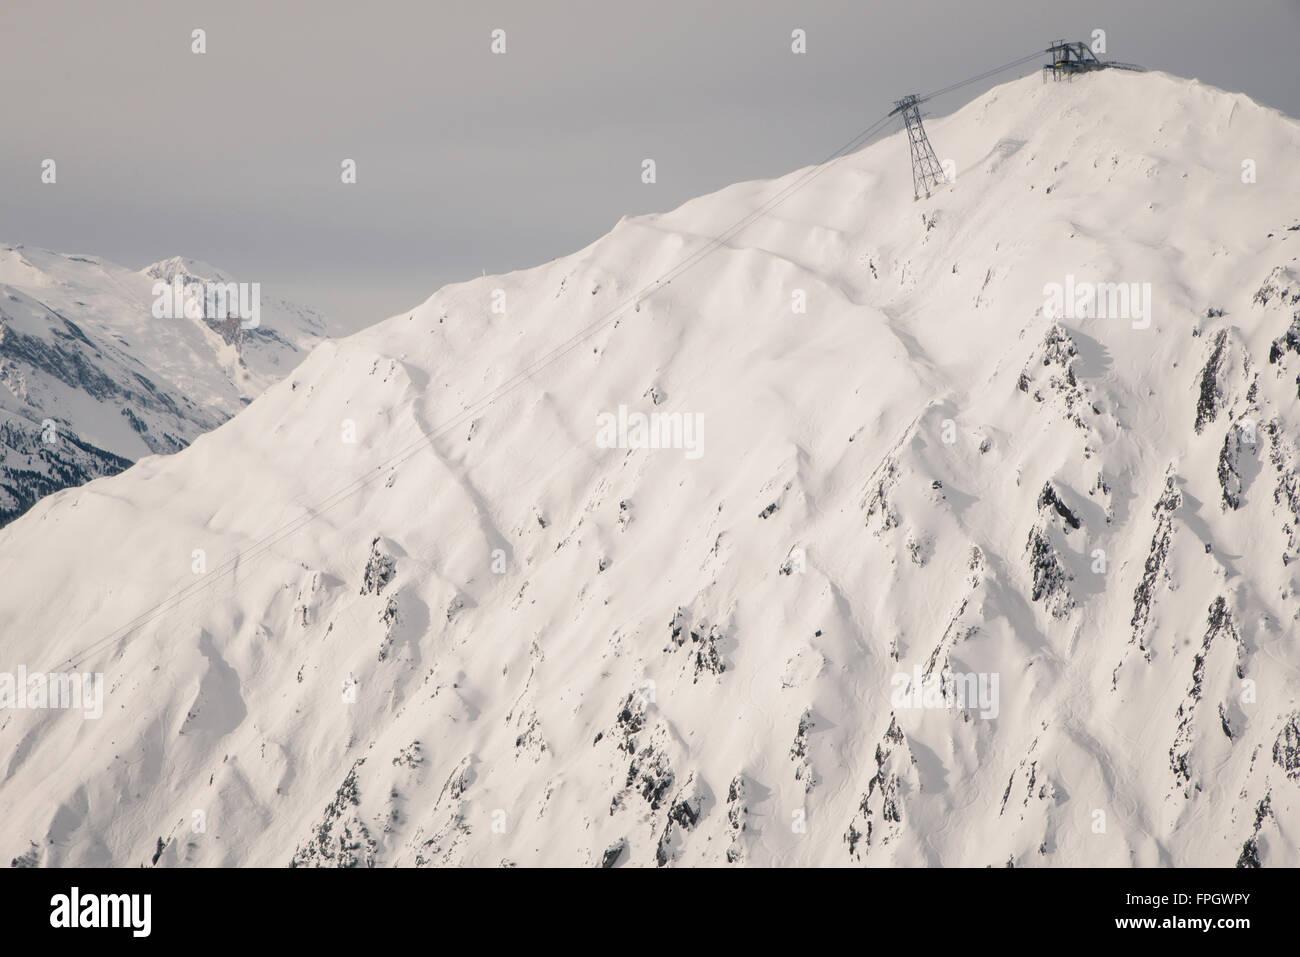 freeriding in Mayrhofen ski resort, austria - Stock Image